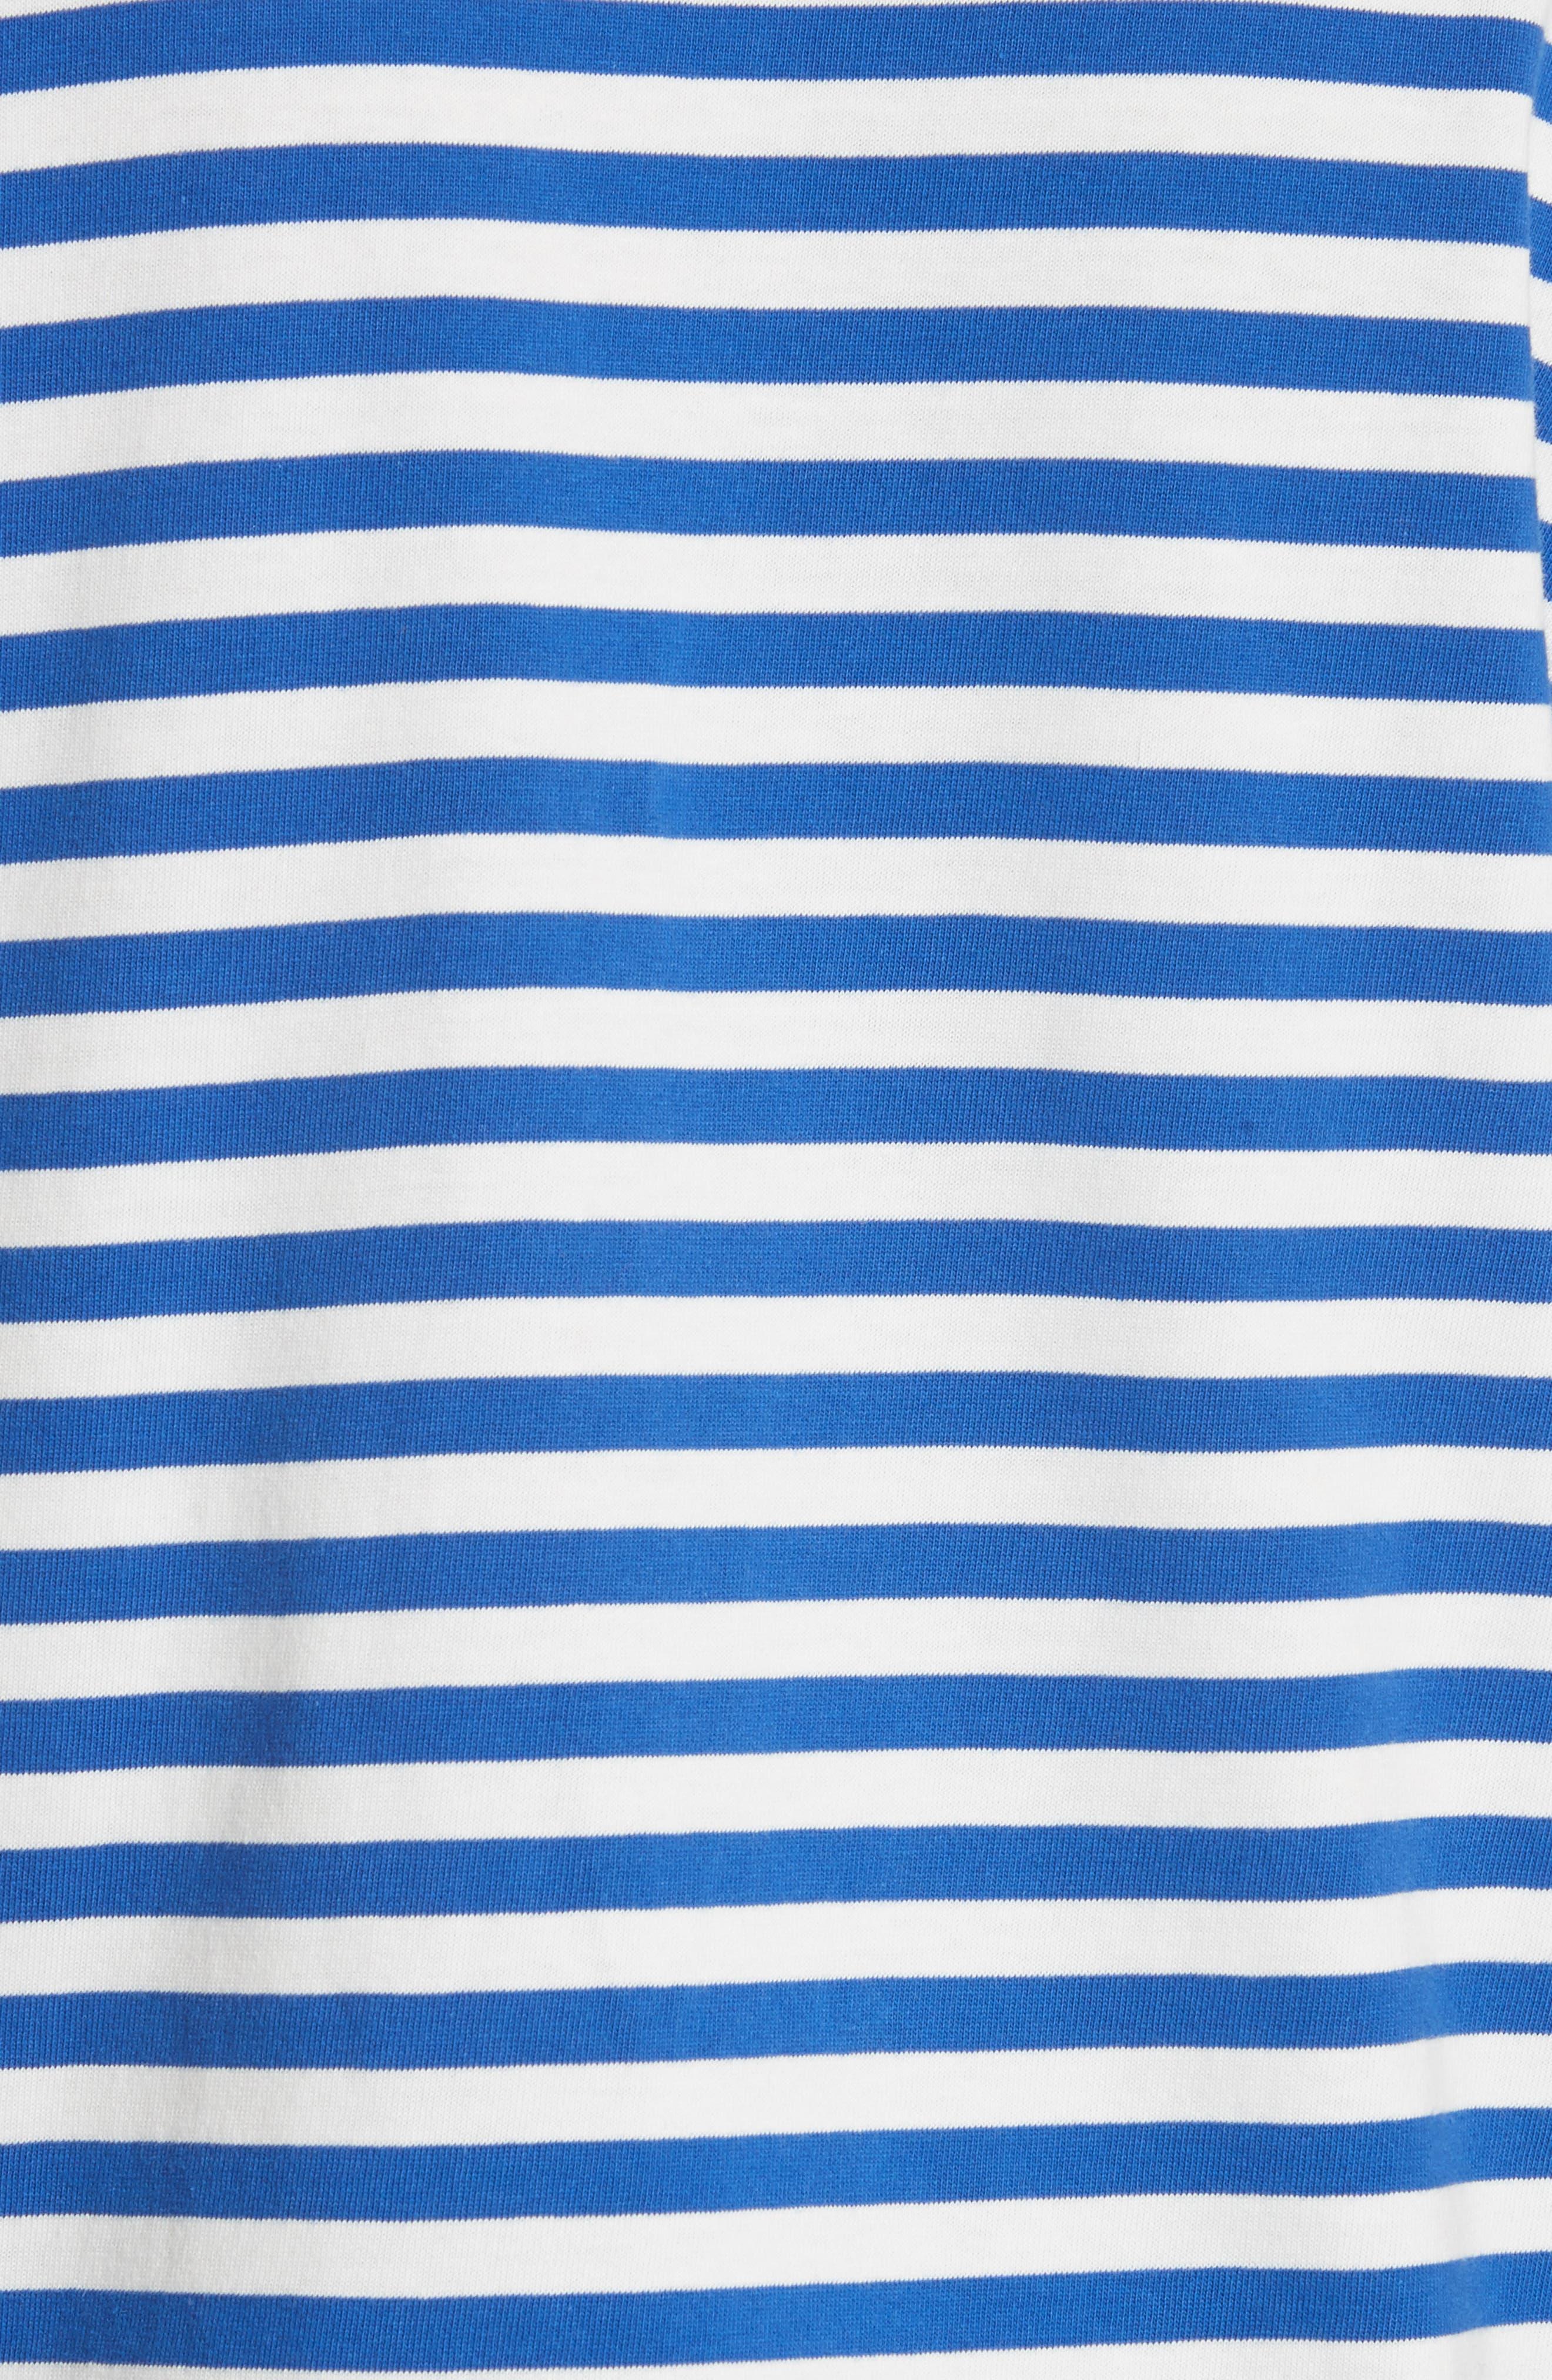 Little Grumps Stripe Tee,                             Alternate thumbnail 5, color,                             SLALOM BLUE CLASSIC STRIPE